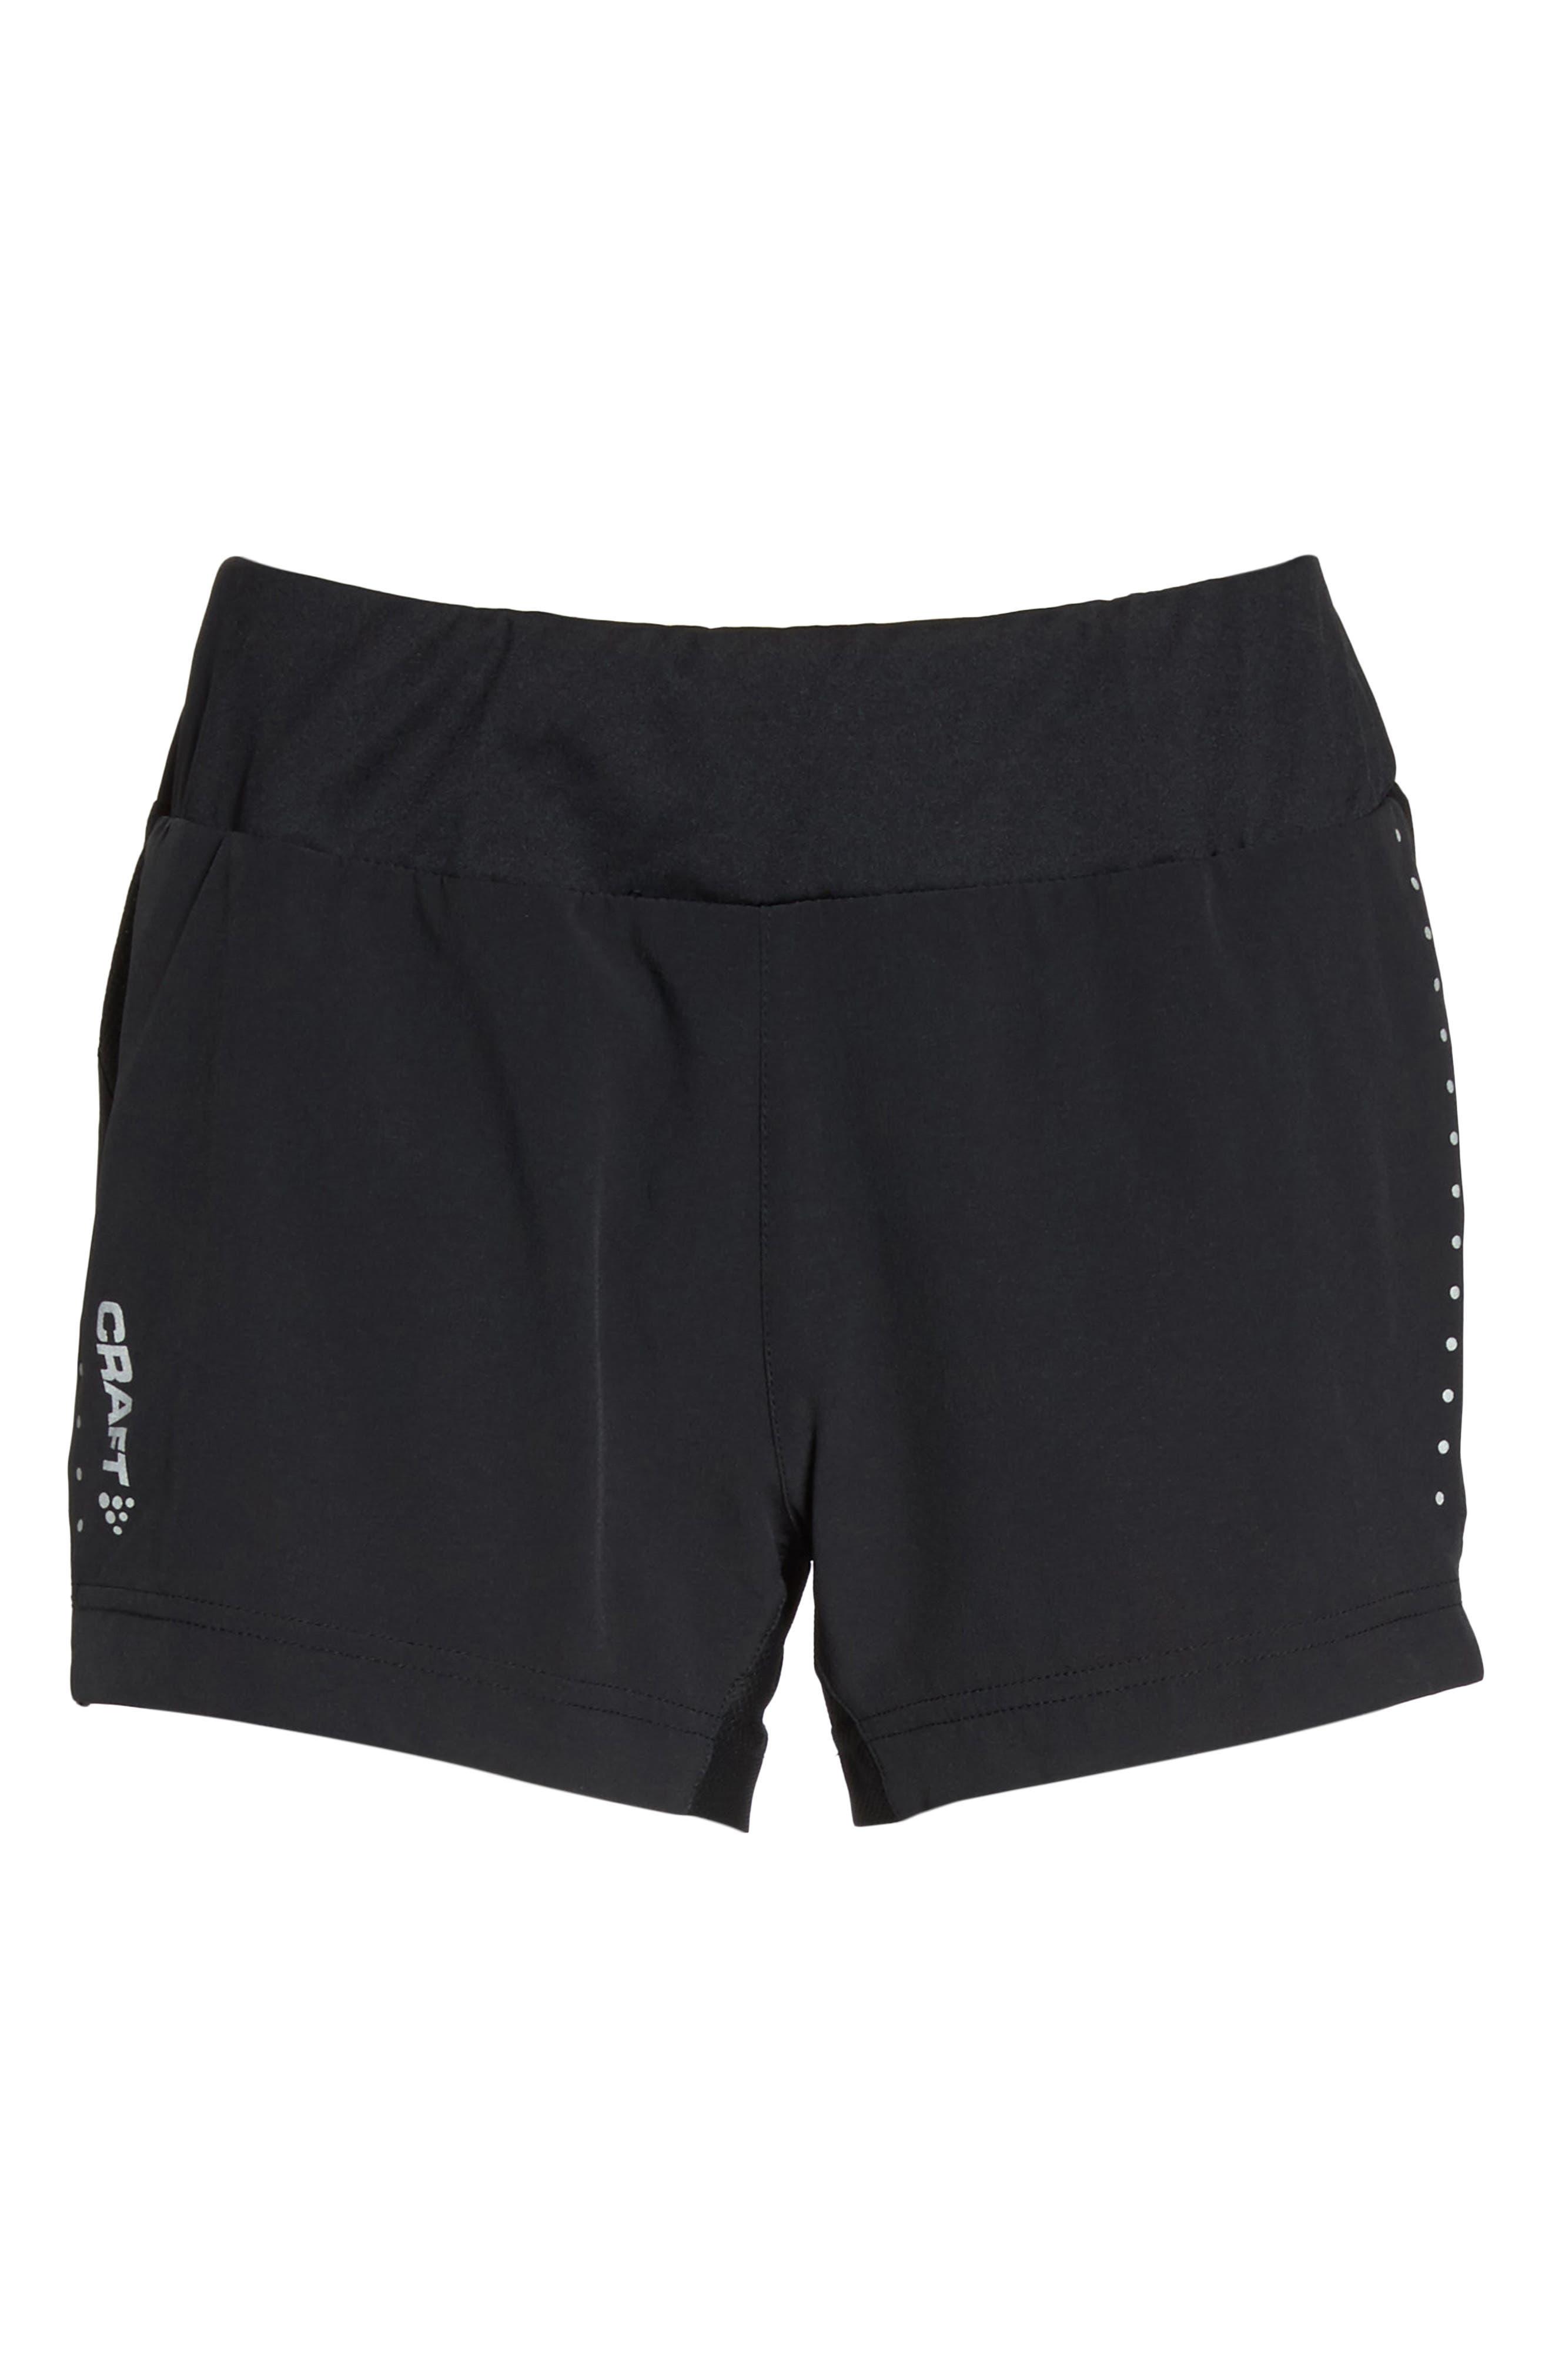 Essential Running Shorts,                             Alternate thumbnail 7, color,                             Black